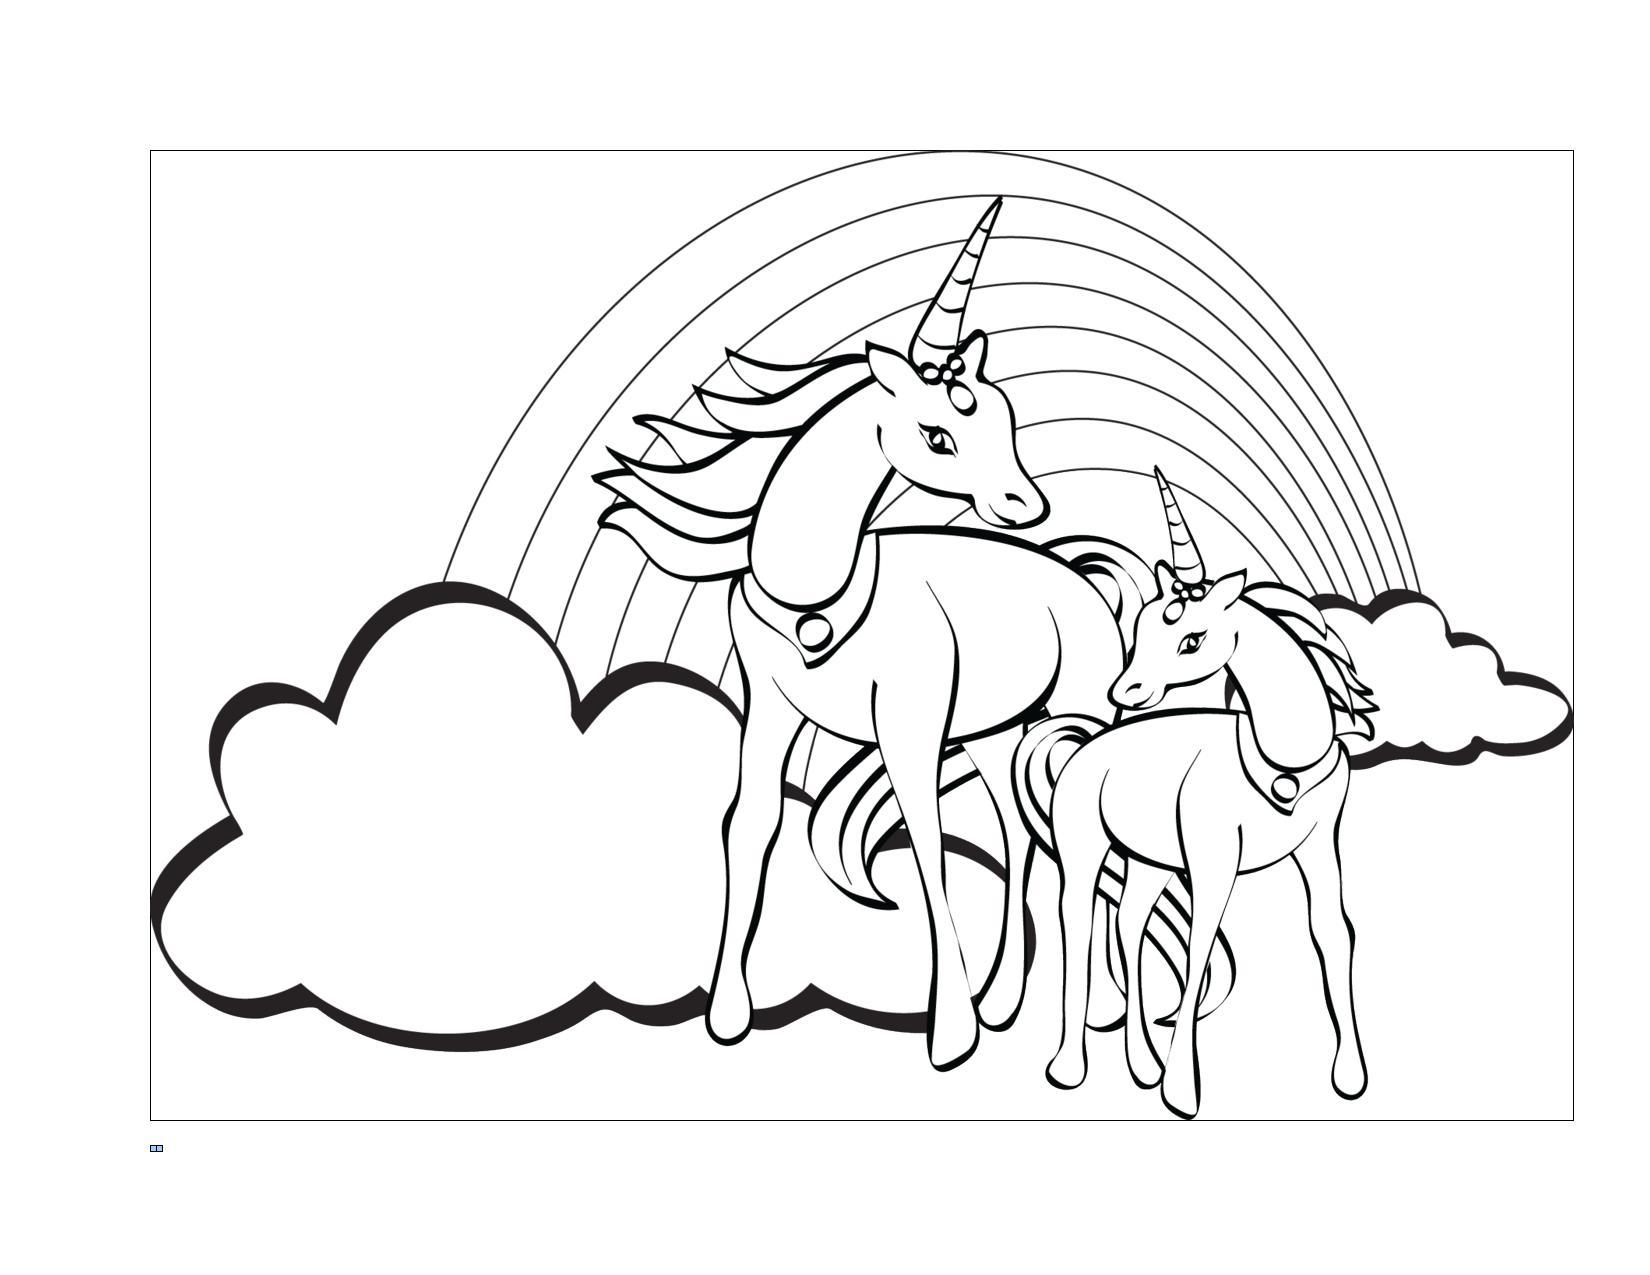 unicorn pictures printable unicorn color pages for kids loving printable pictures unicorn printable